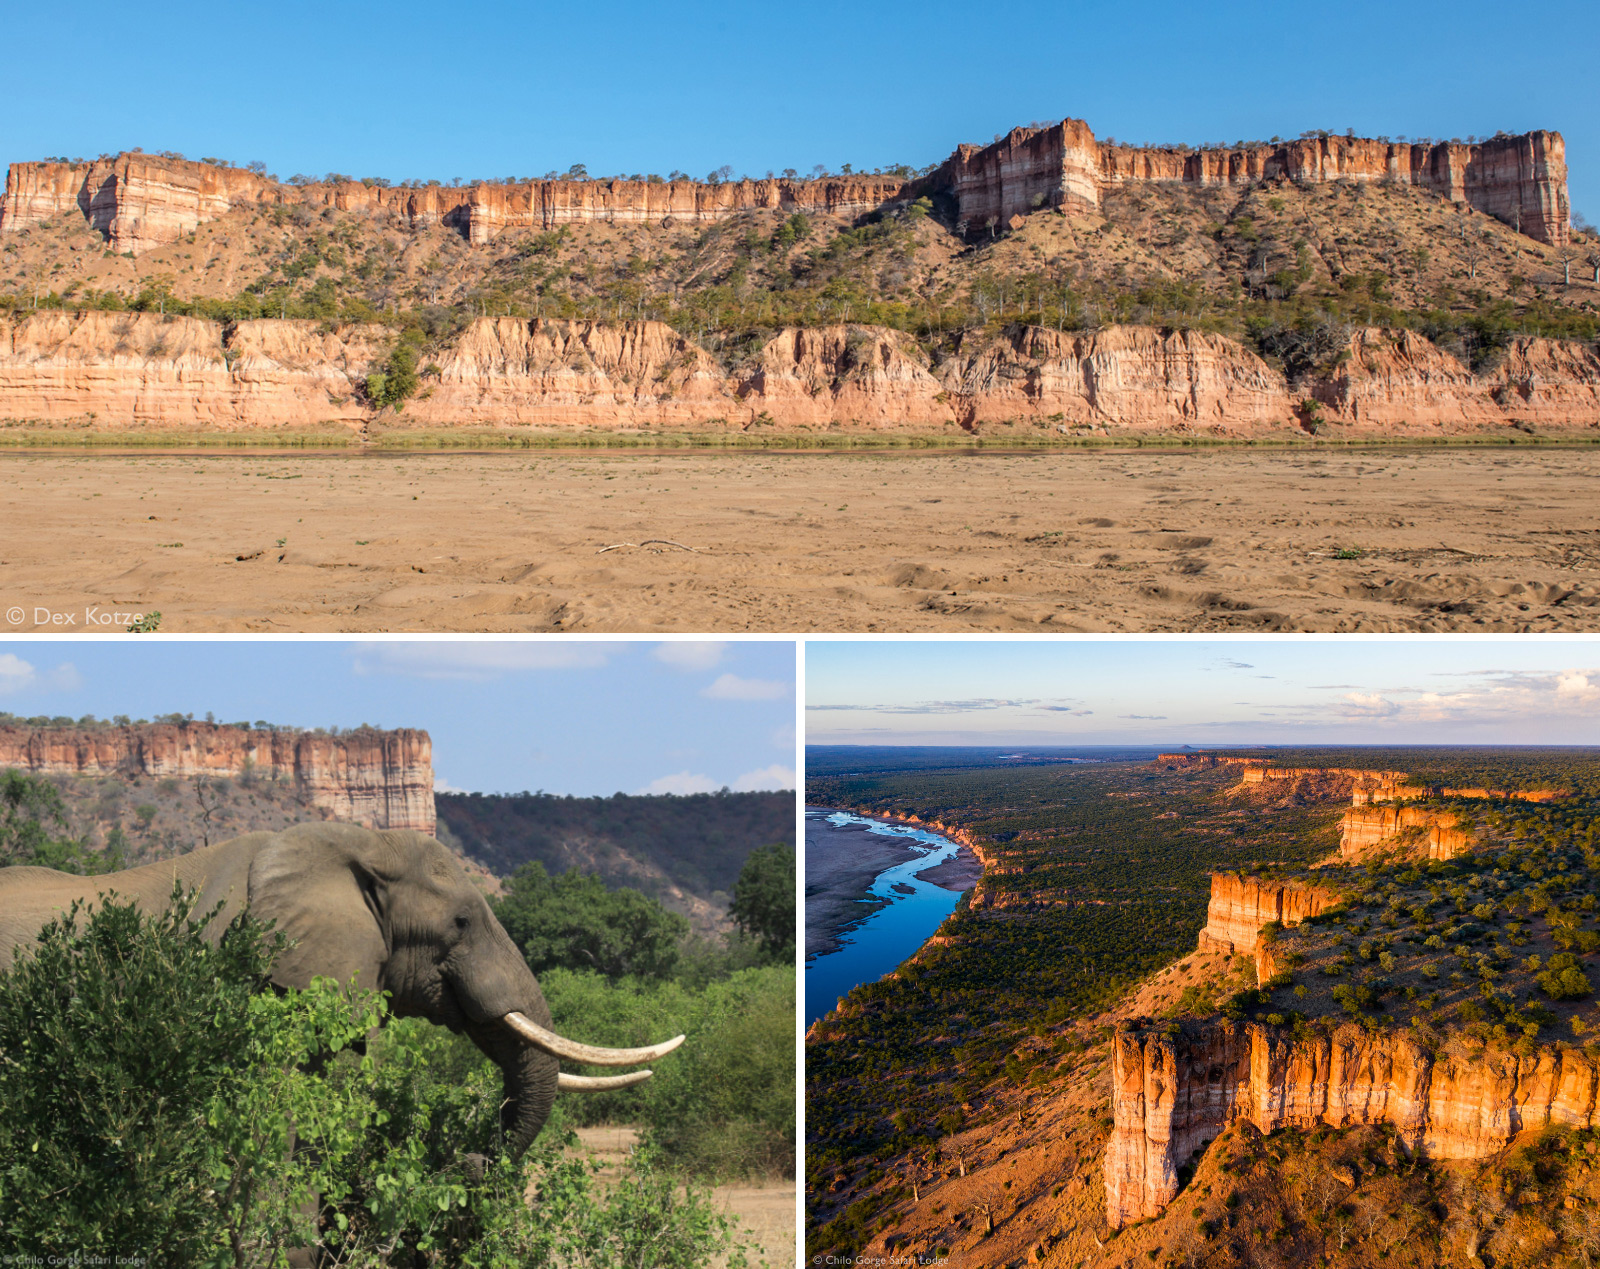 Chilojo Cliffs in Zimbabwe